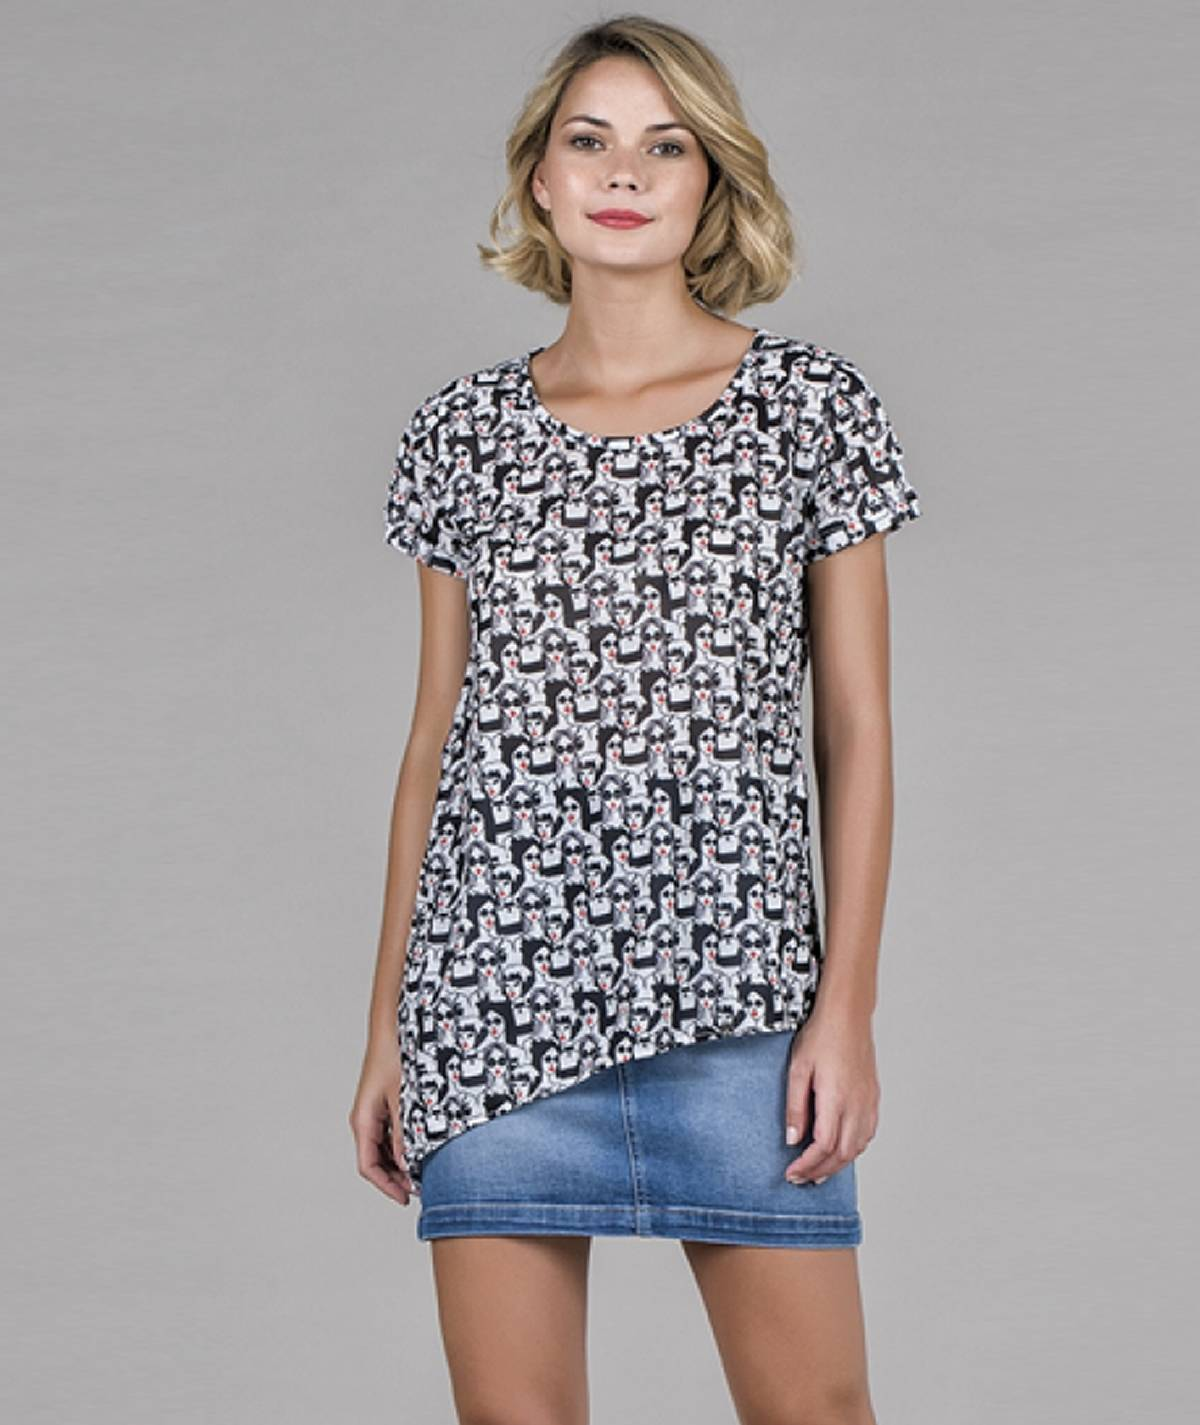 T-shirt Assimétrica caras